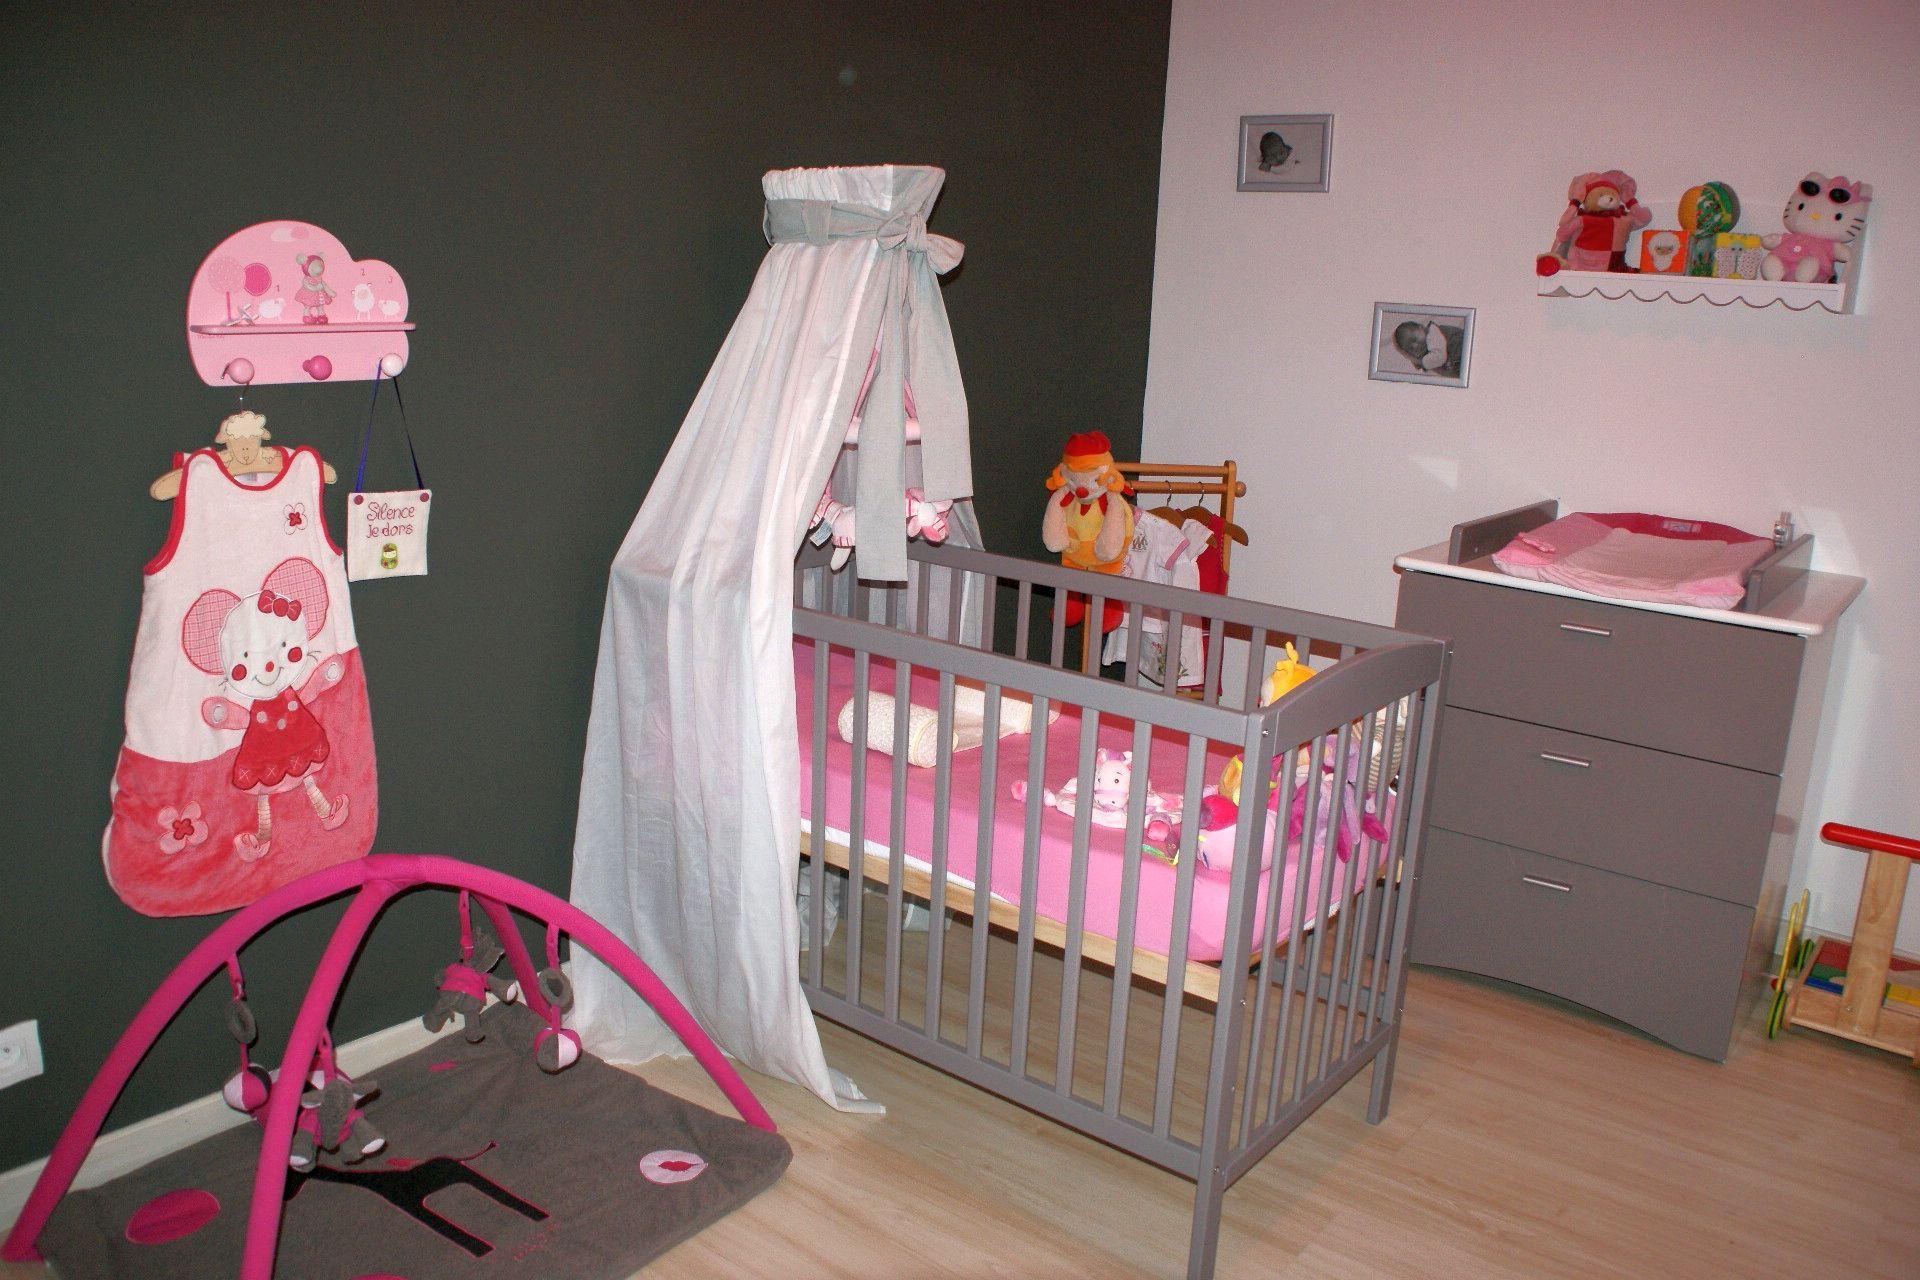 Gris, rose, blanc, ta chambre est prête petite puce ...